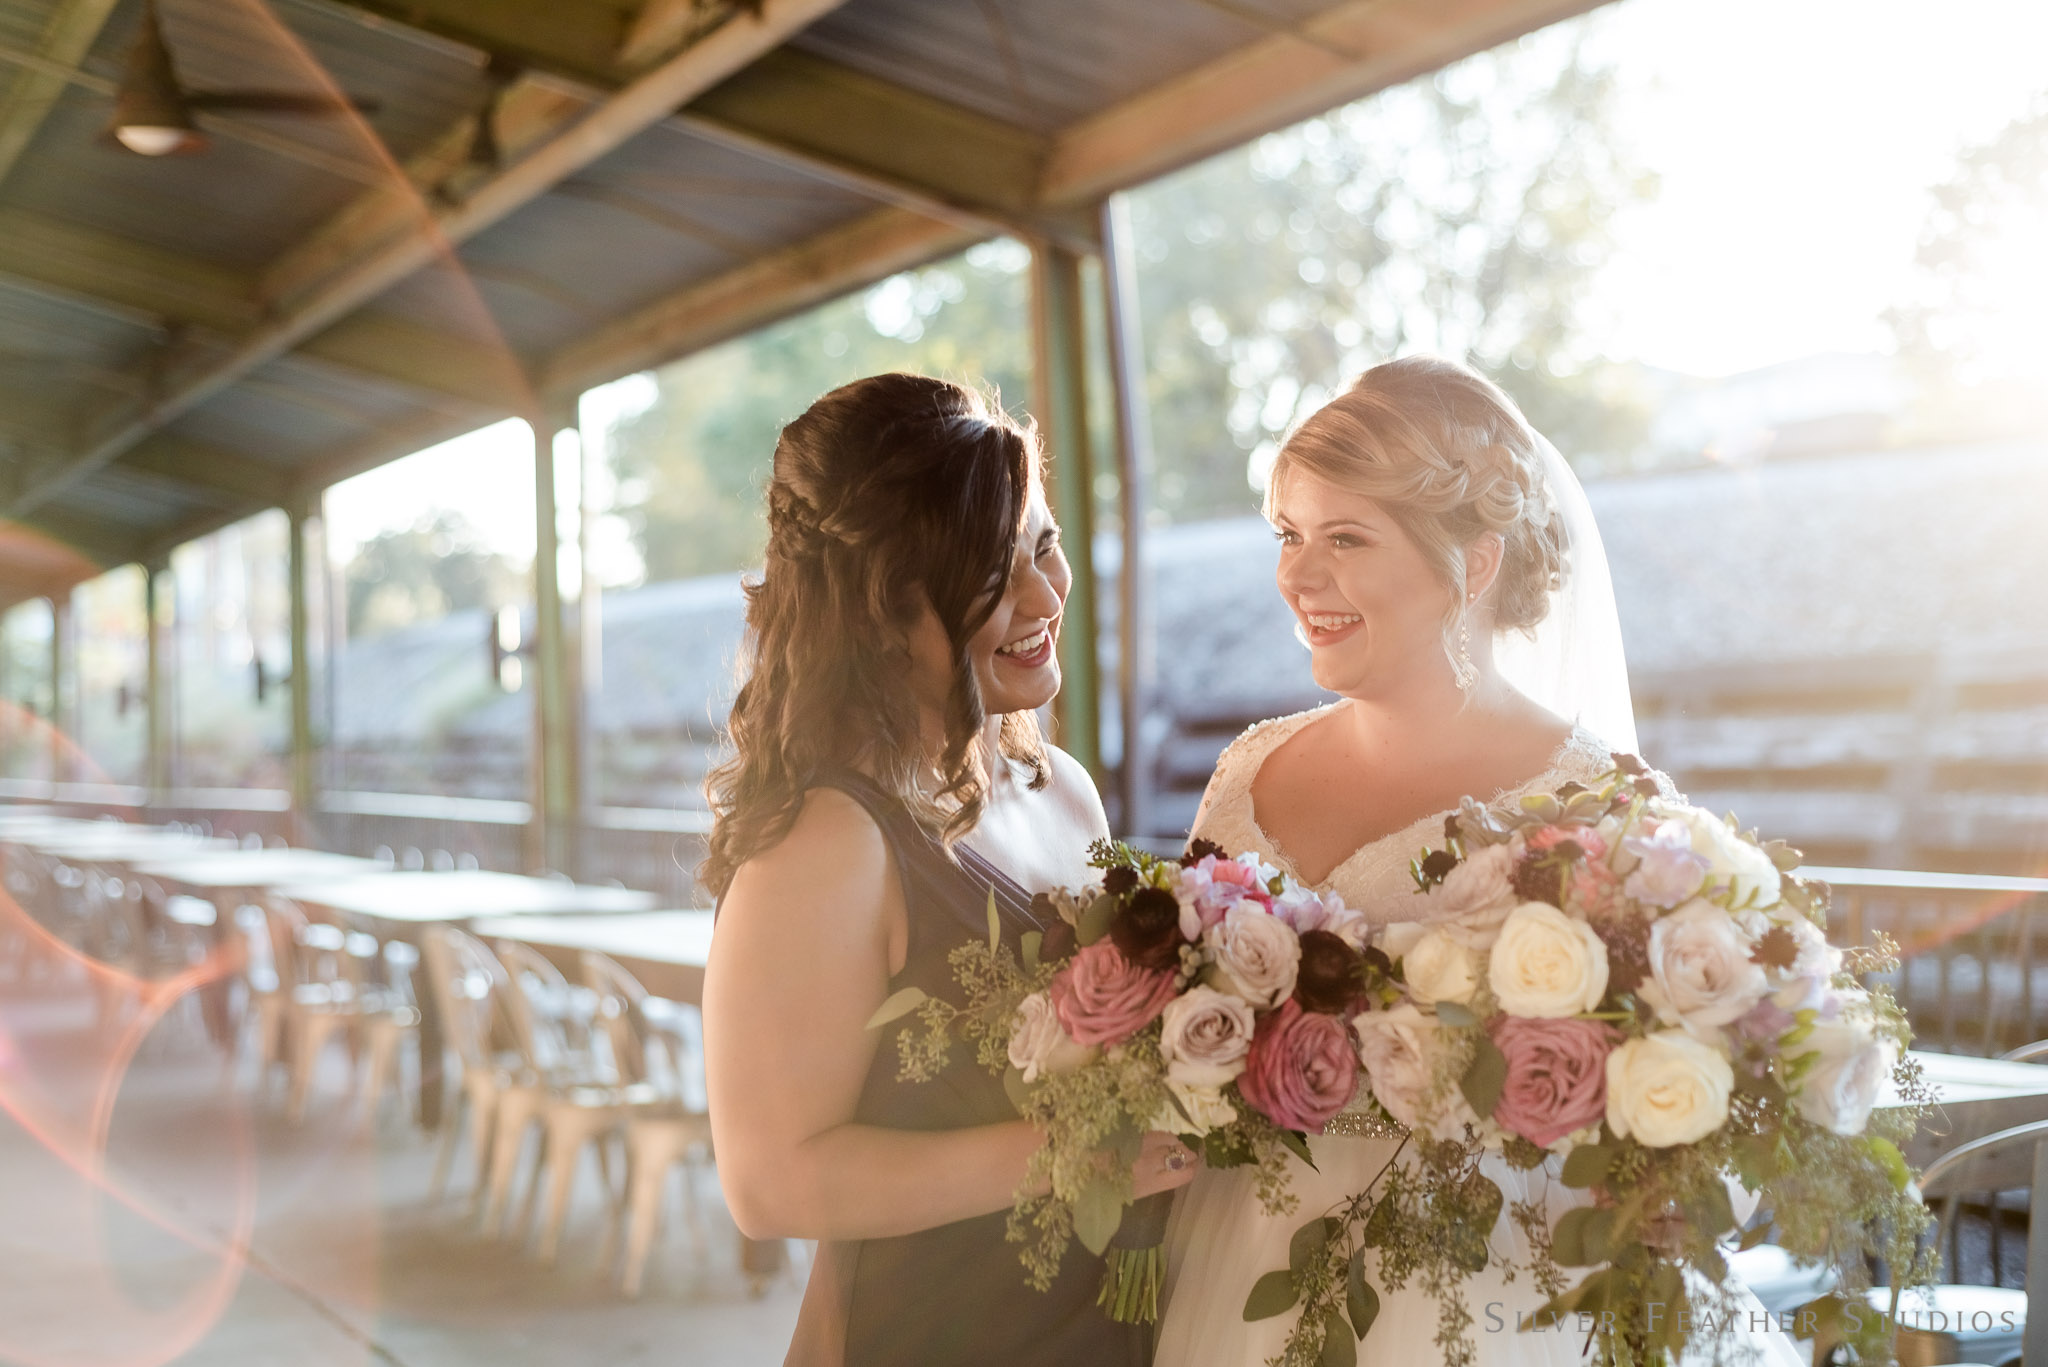 cottom-room-wedding-photography-023.jpg